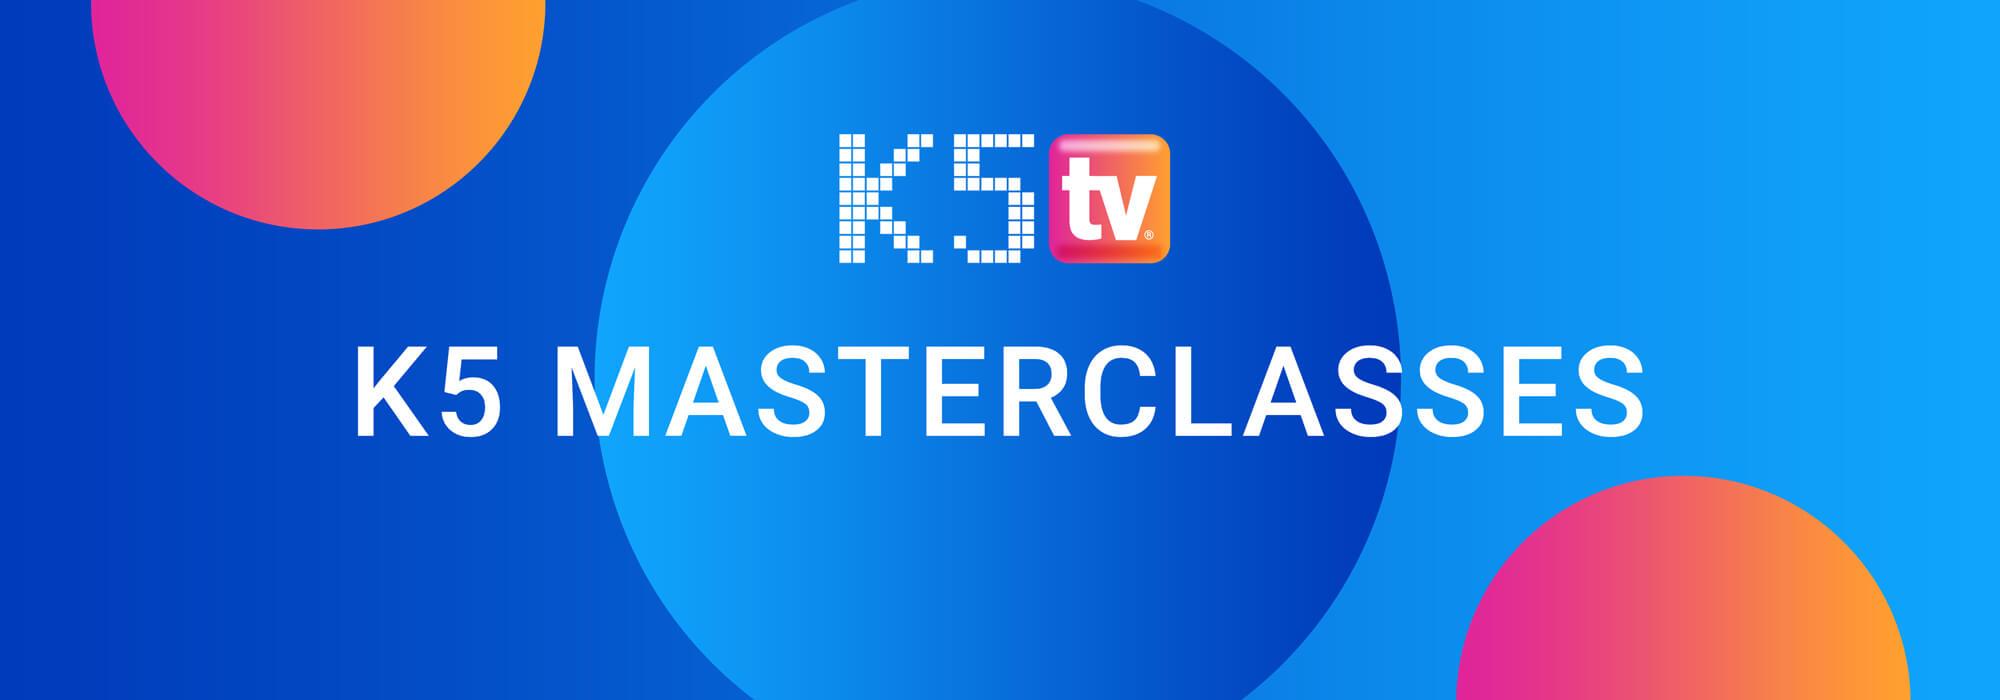 Die Masterclasses im K5 TV Programm